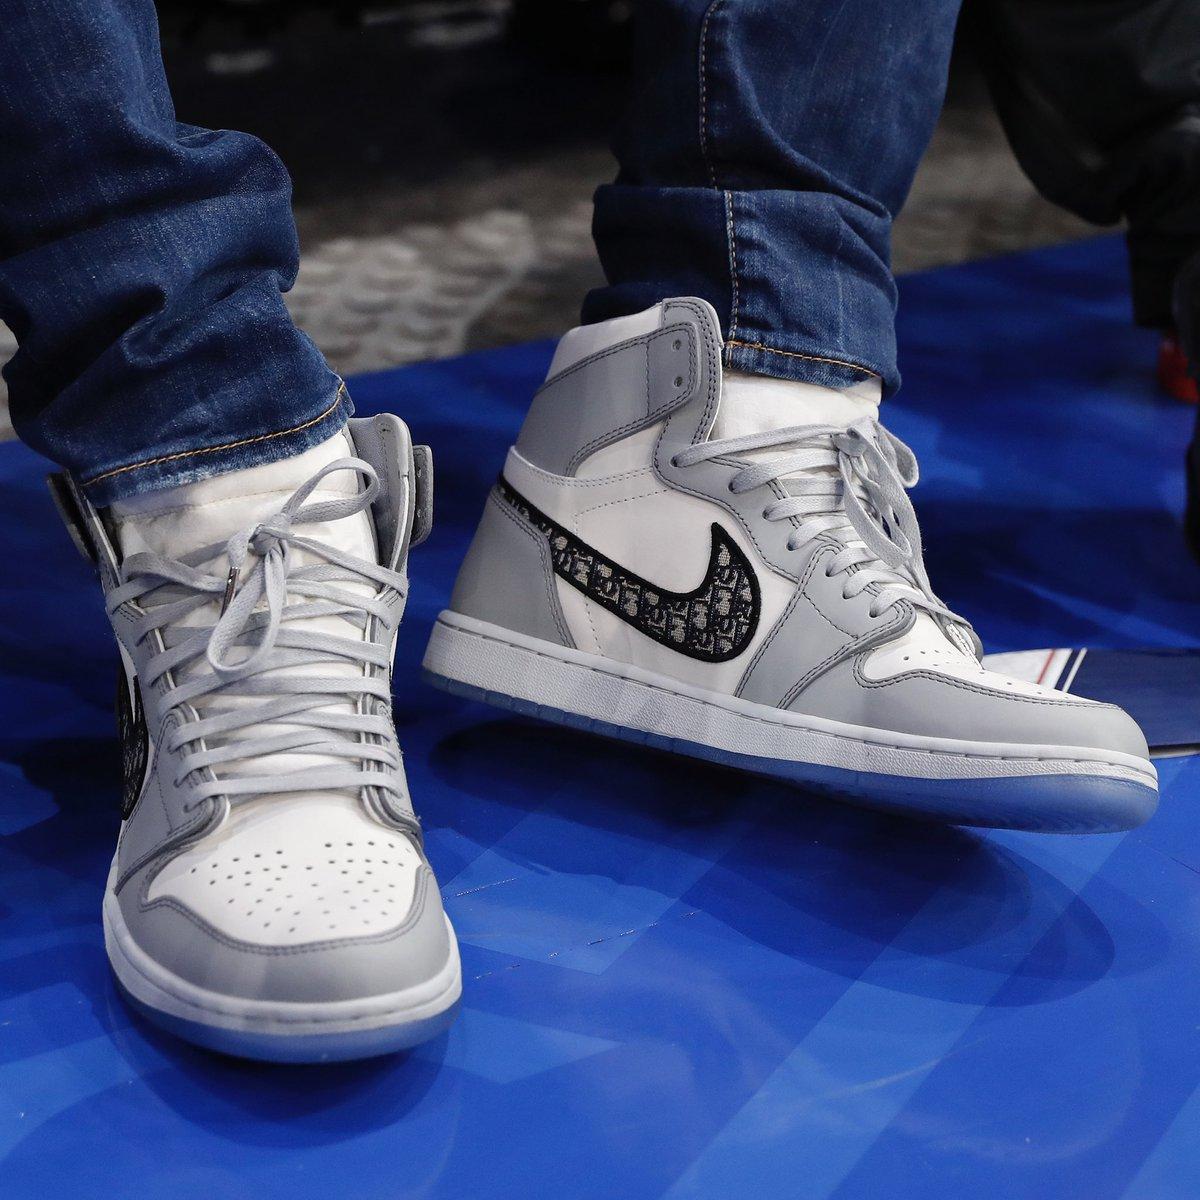 #NBACelebRow 🔥   @KMbappe courtside in Paris wearing Dior x Air Jordan 1's! #NBAKicks